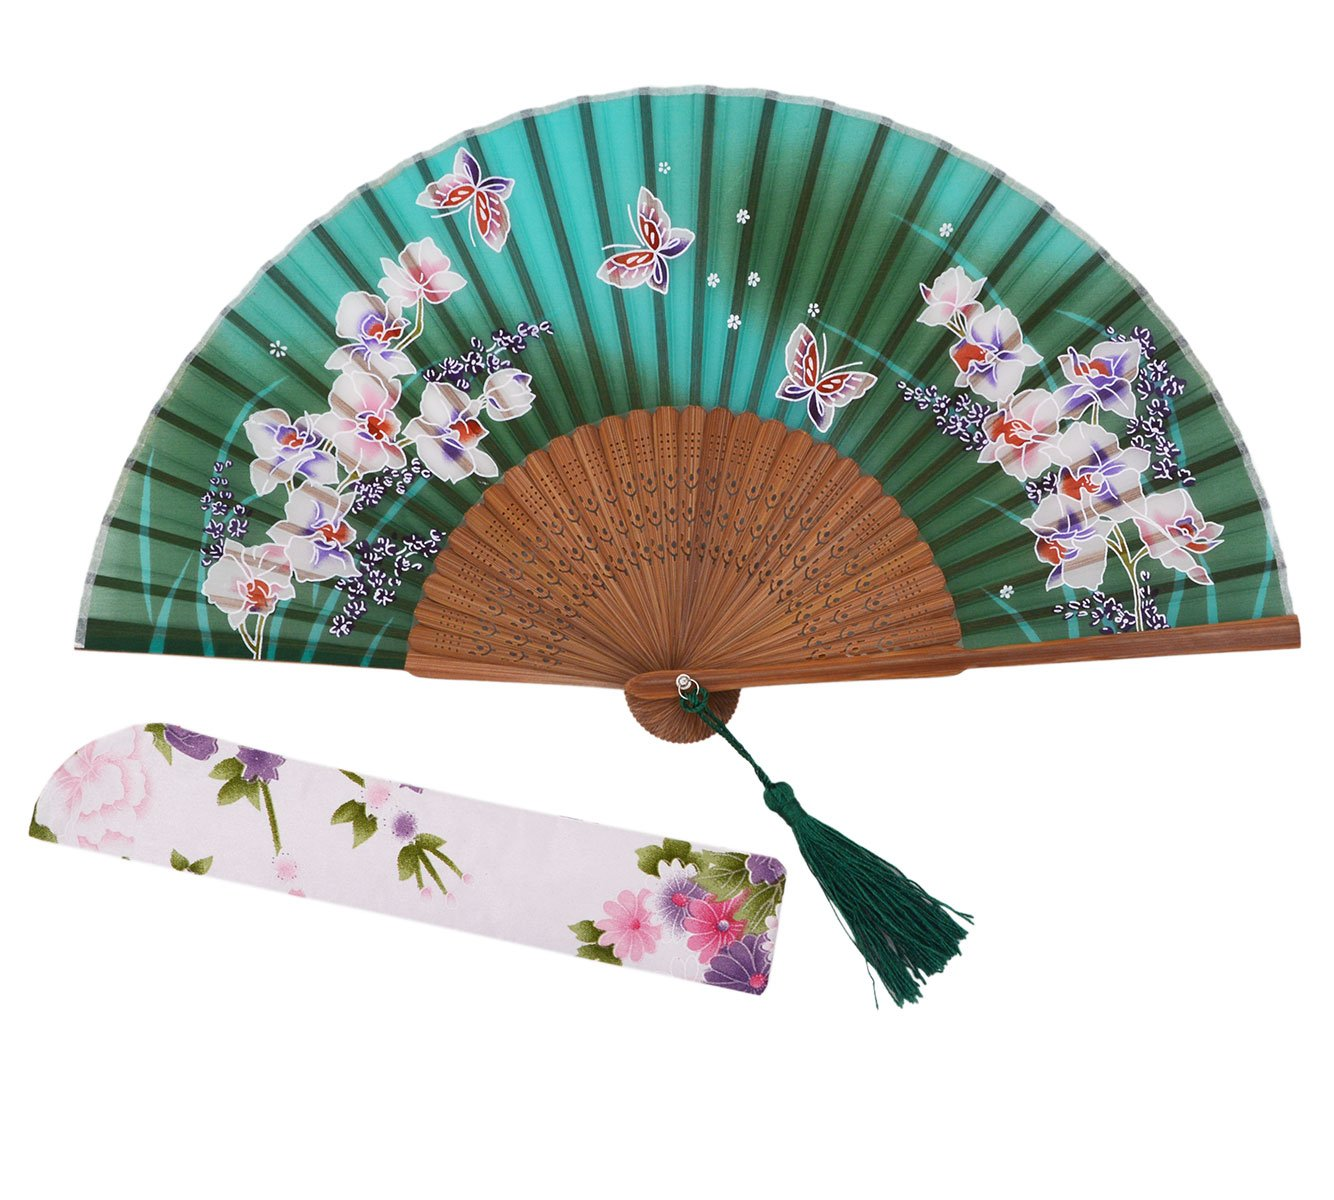 Meifan Chinese/Japanese Womens Handmade Silk Folding Hand Fan (Green)